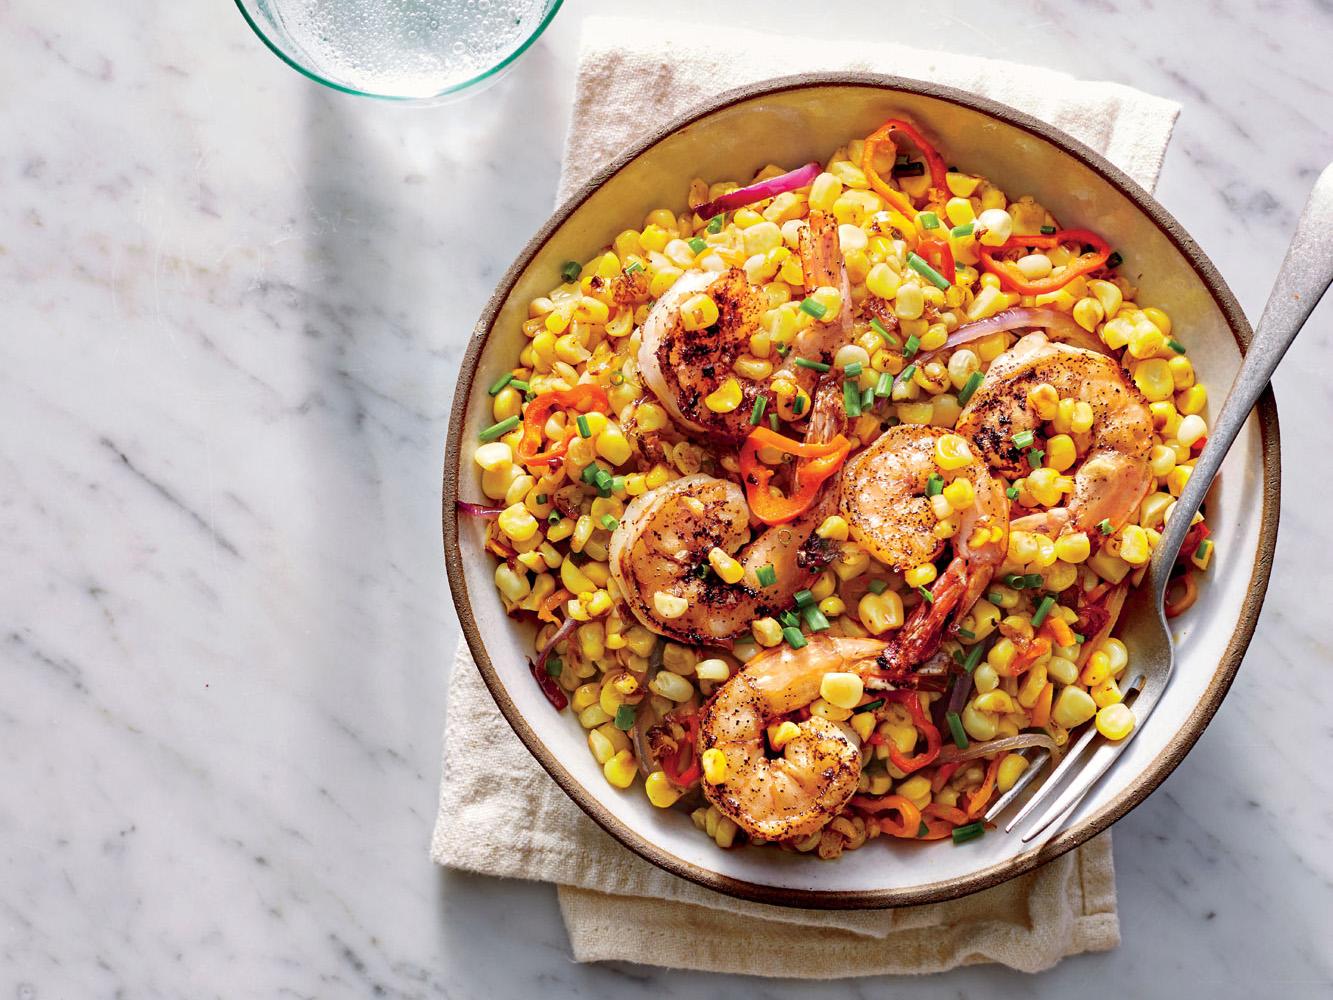 Brined Shrimp with Charred Corn Salad